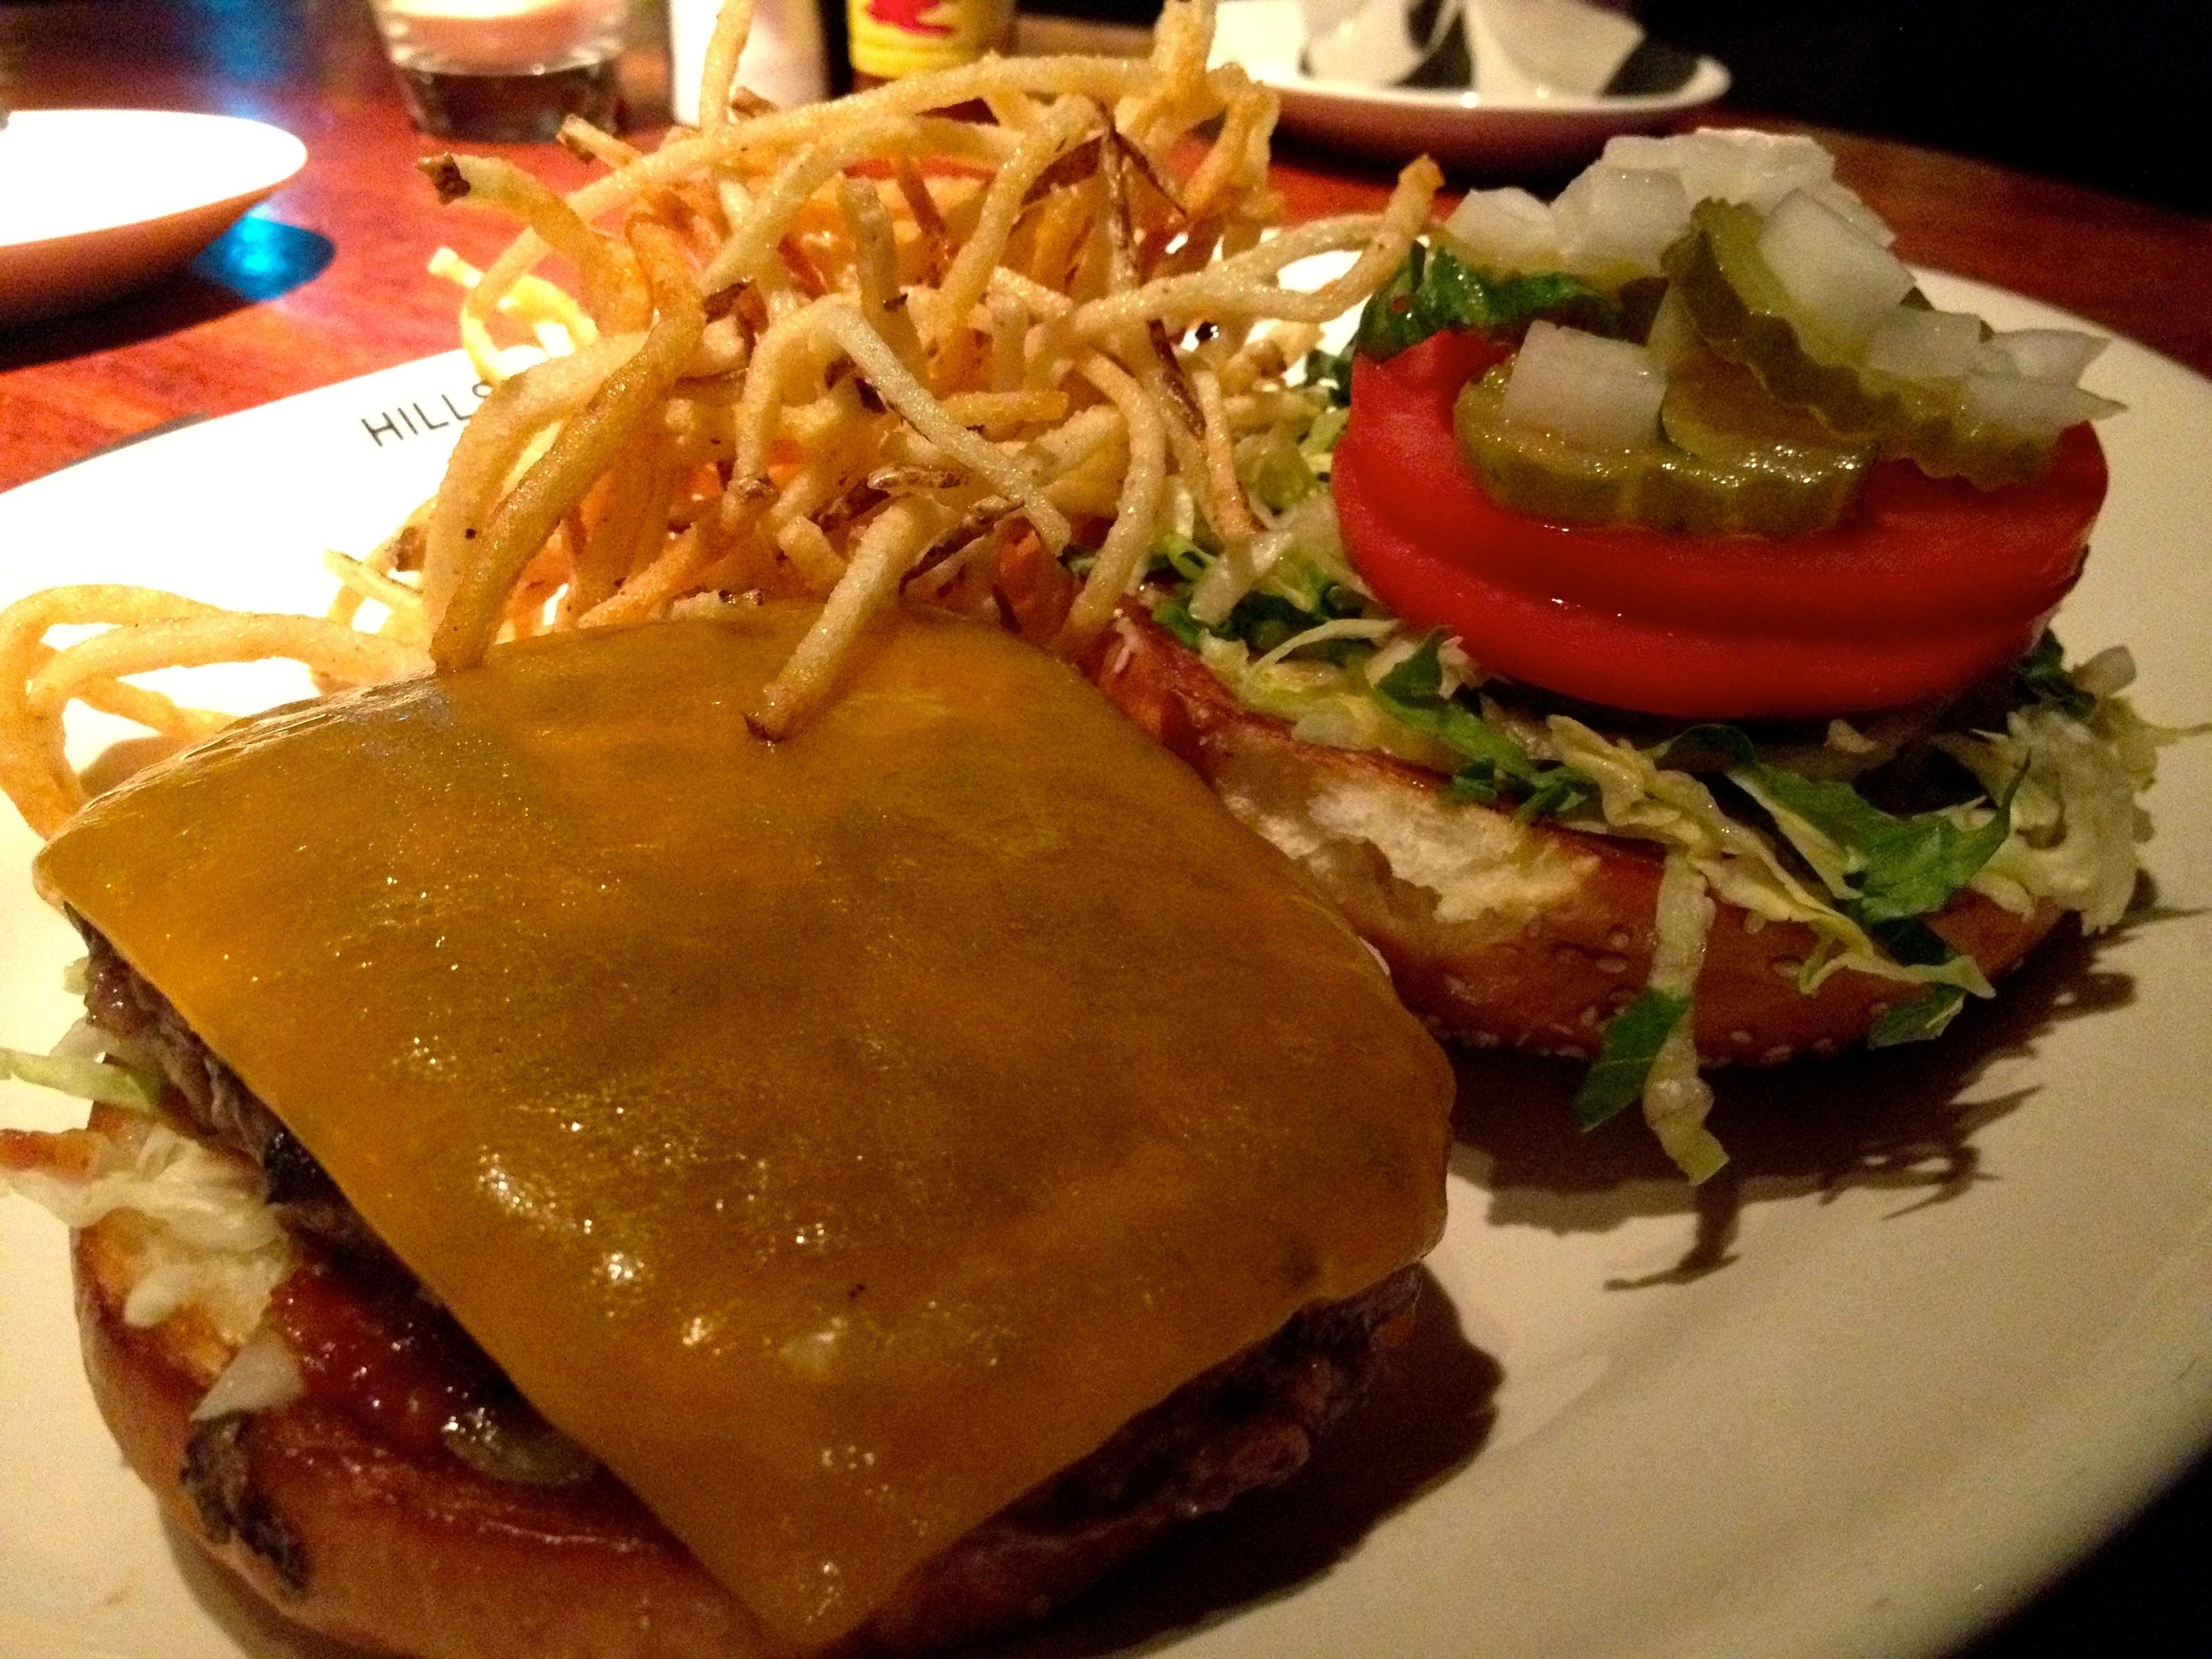 houston's cheeseburger